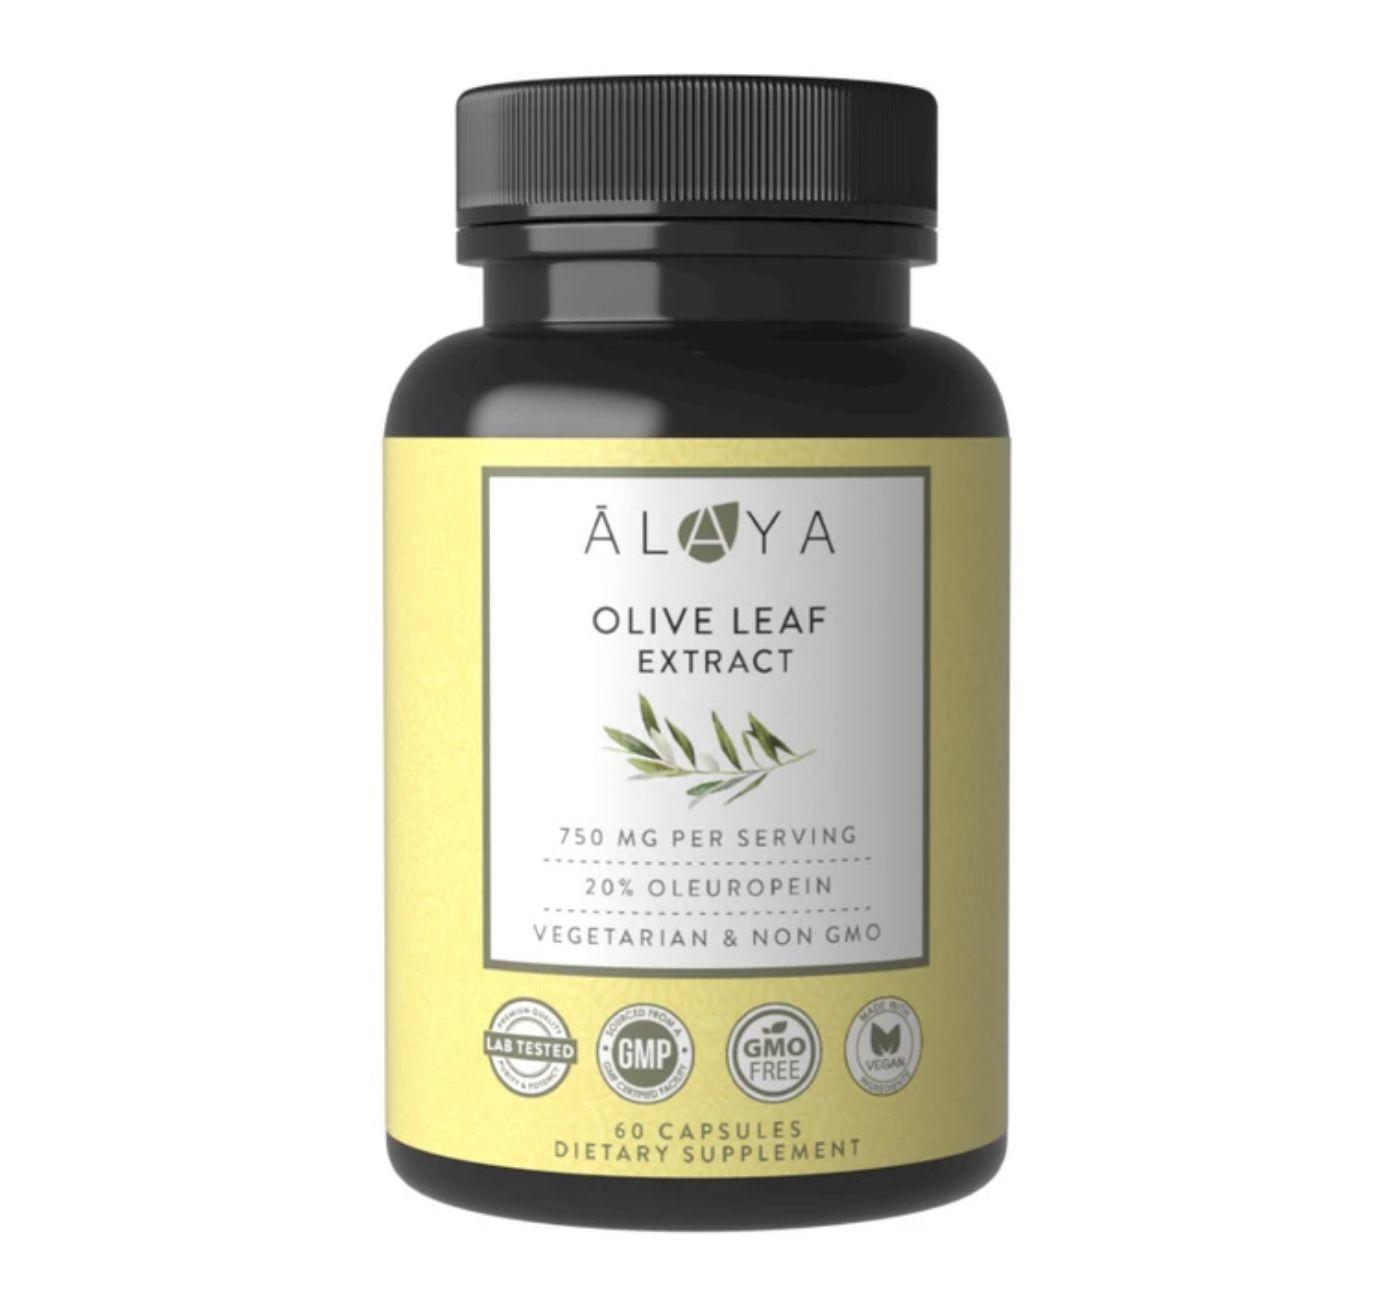 Alaya olive leaf extract